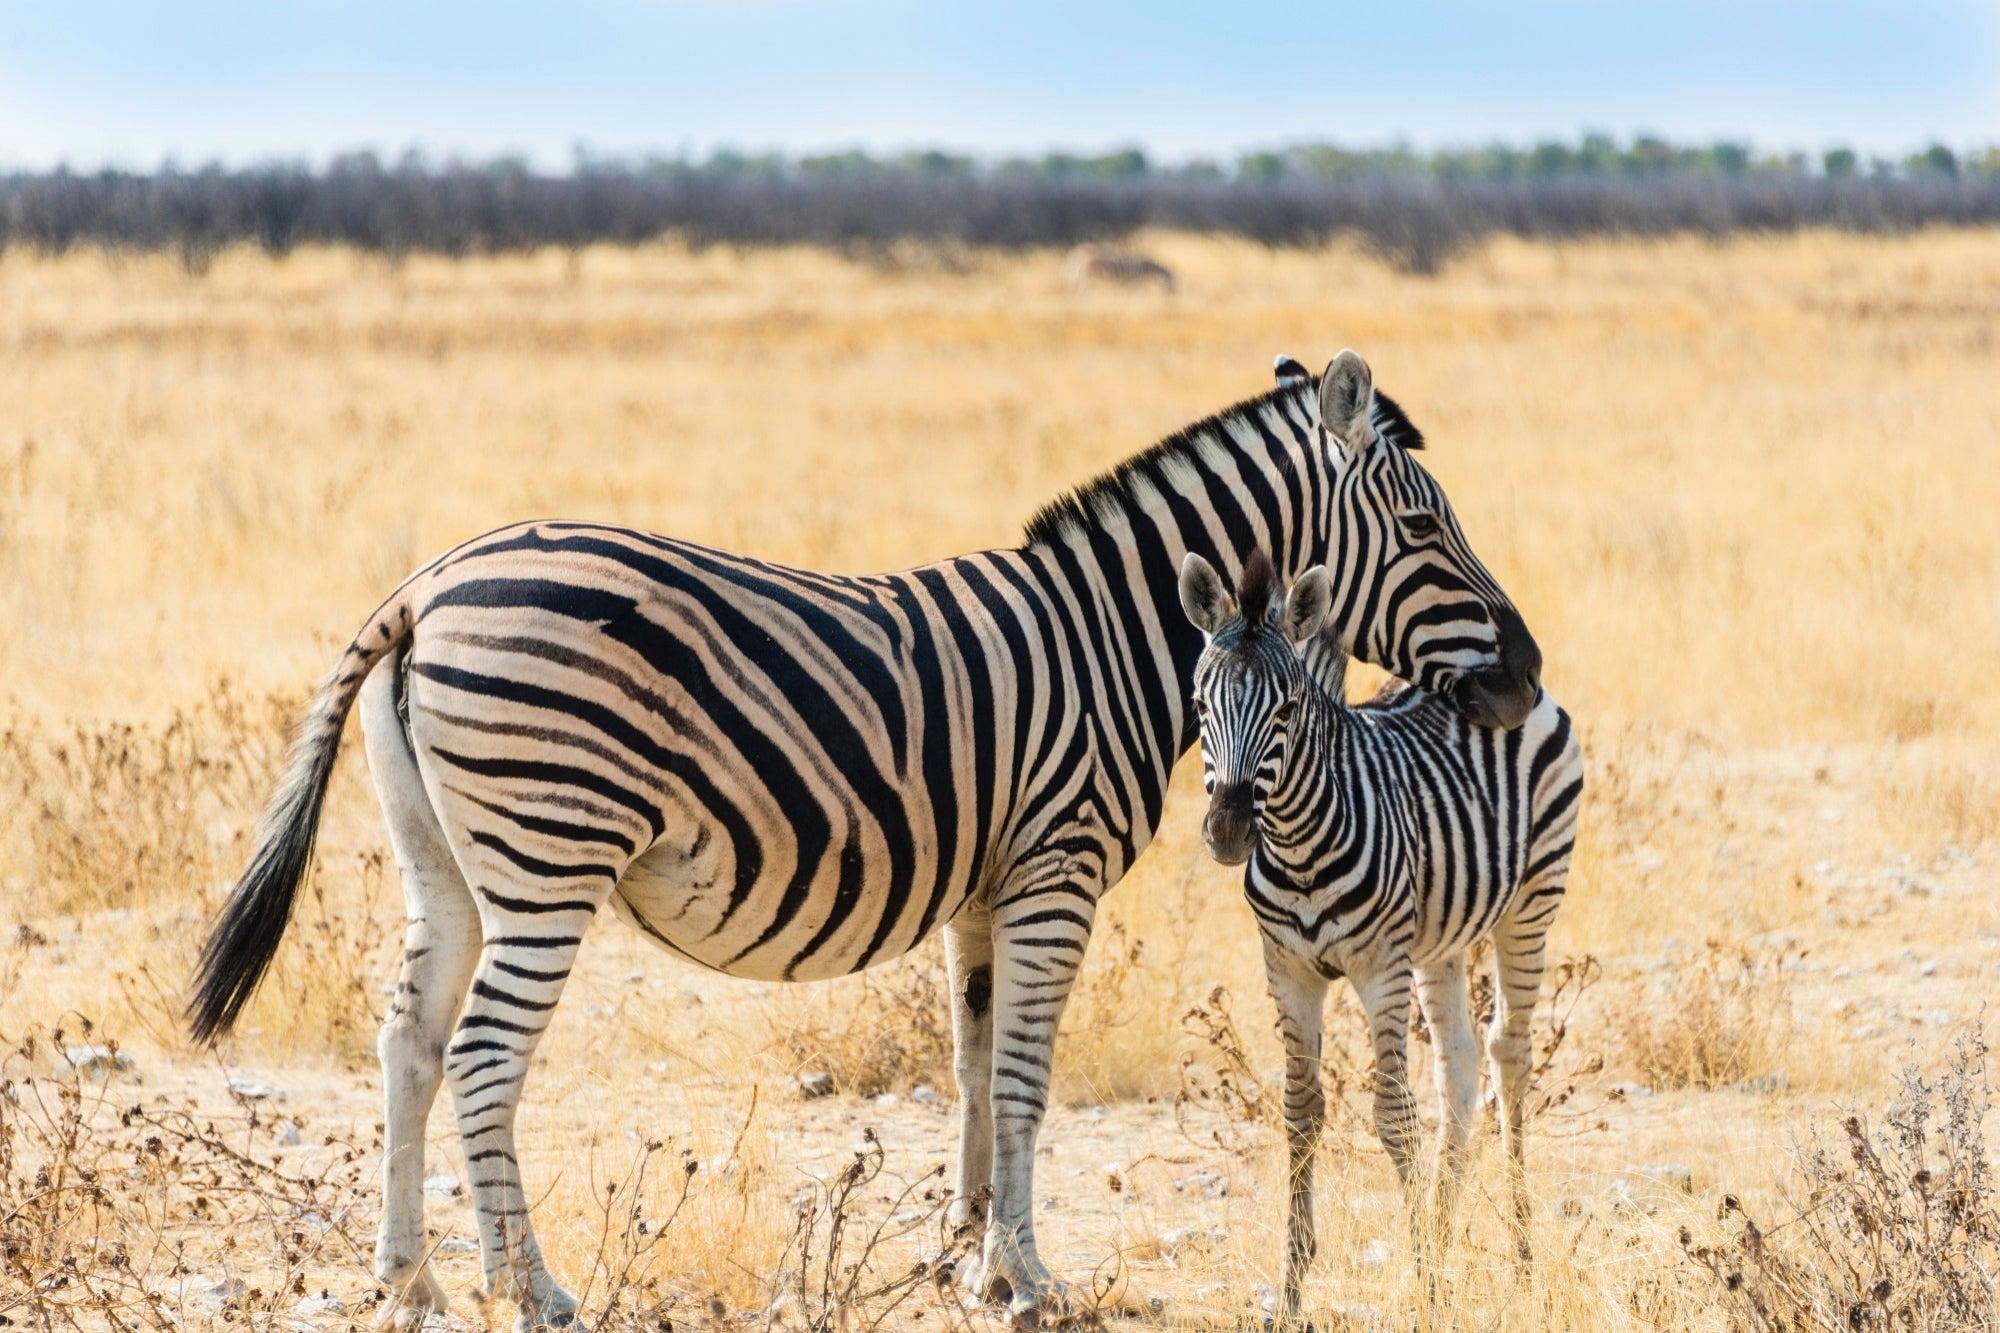 Zebra companies, not unicorns, will rebuild Latin America's economy in 2021